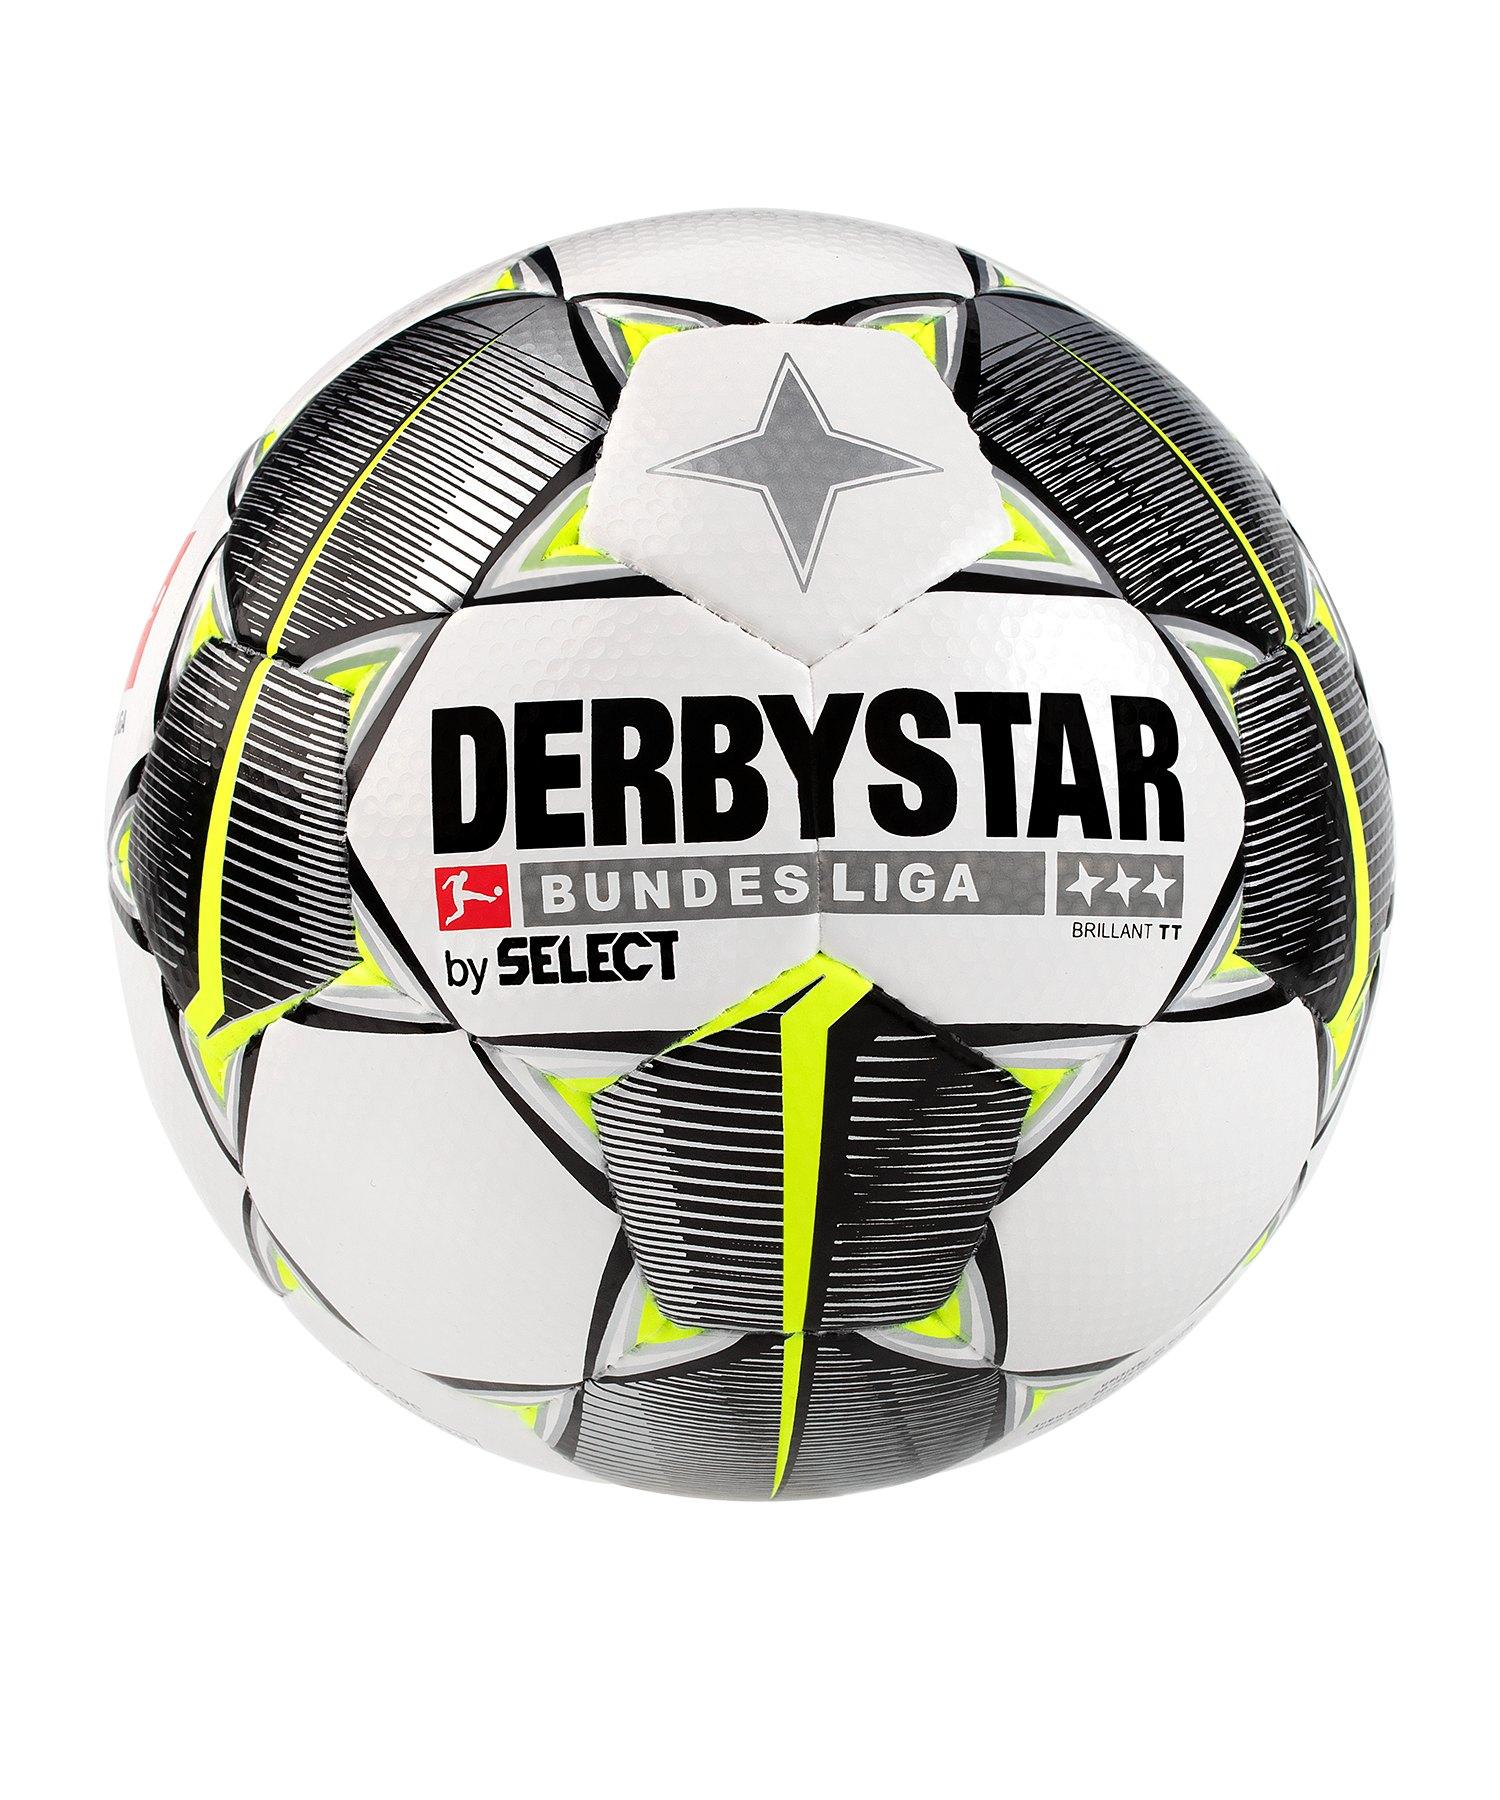 Derbystar Bundesliga Brillant TT HS Trainingsball Weiss F019 - weiss